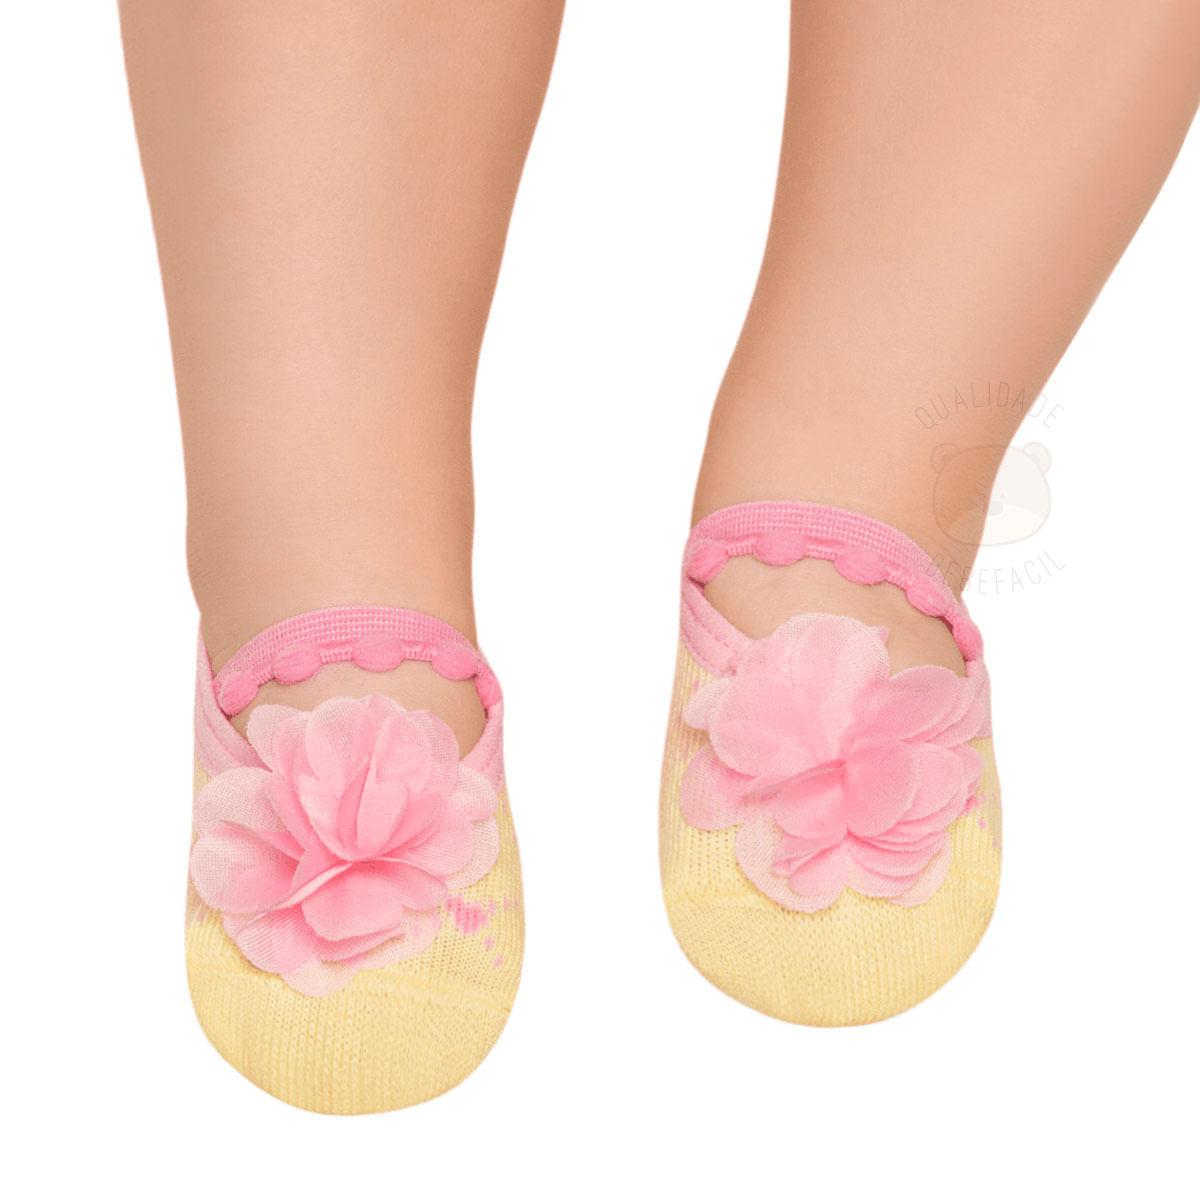 cdda18cecd Meia Sapatilha para bebê Flor Amarela - Puket no bebefacil loja de roupas  enxoval e acessorios para bebes - bebefacil